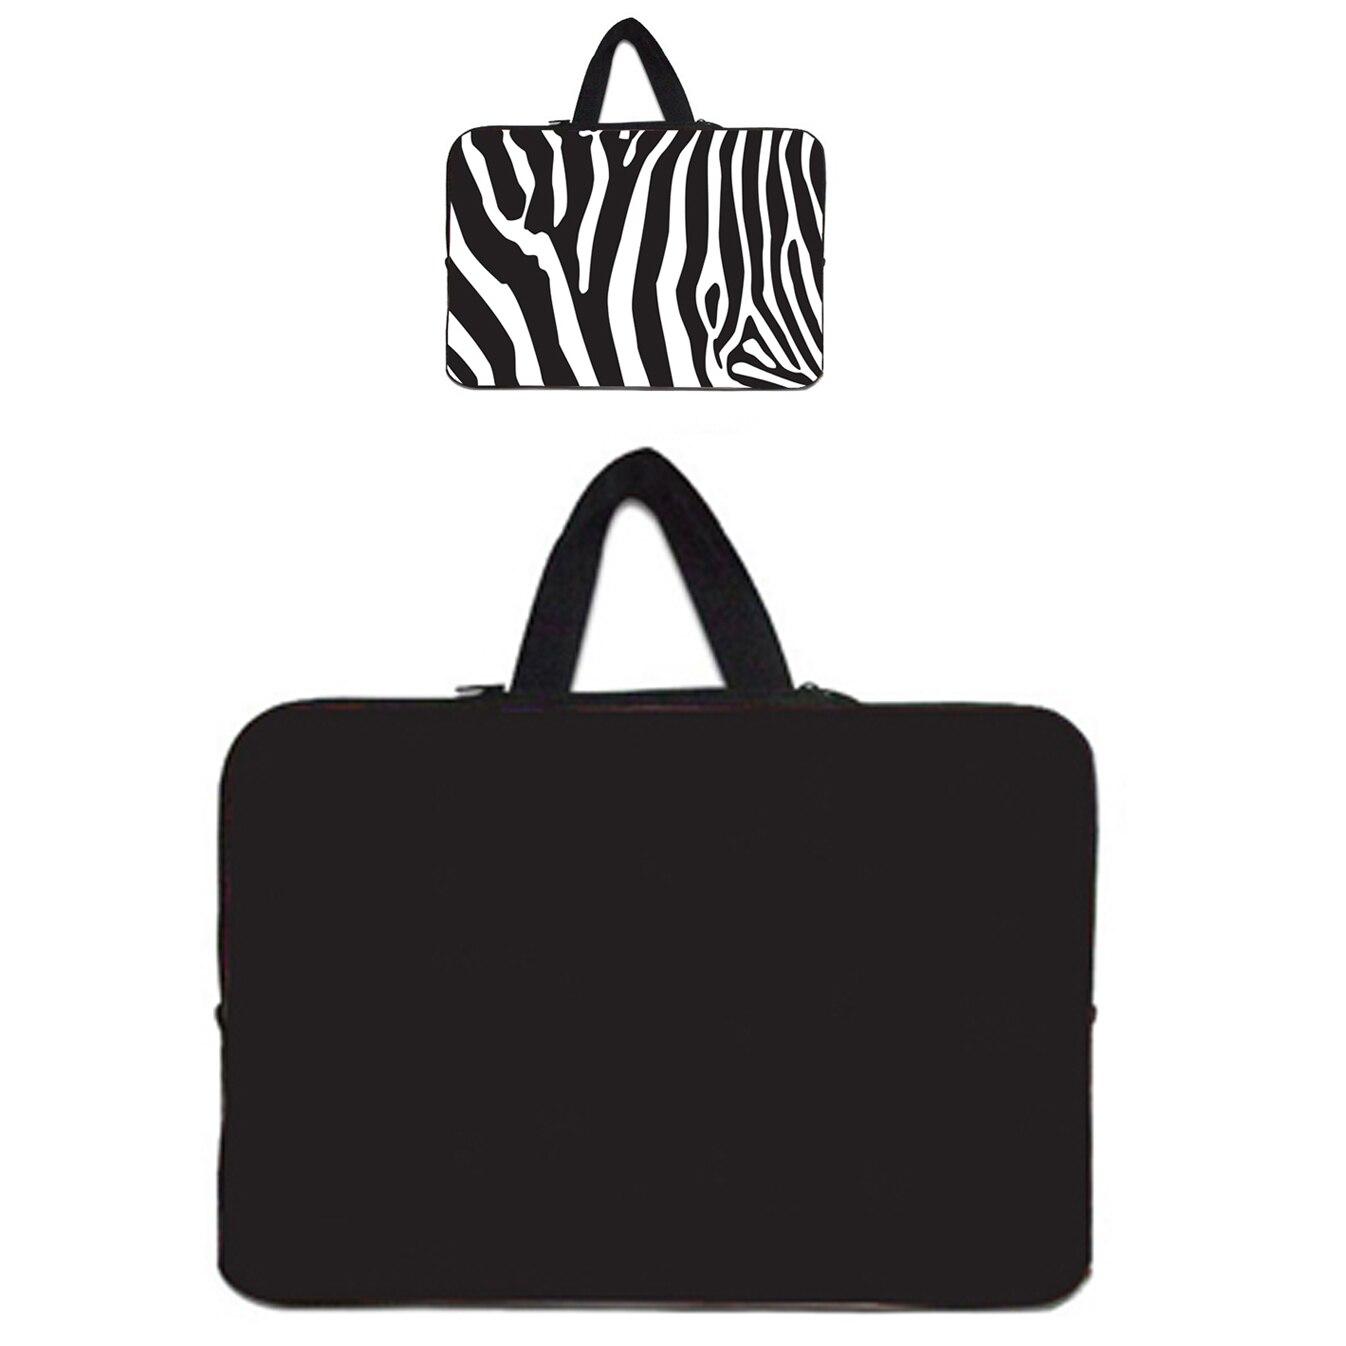 10 15 14 12 13 17 Inch Sleeve Neoprene Notebook Bags For Sony Lenovo Yoga Dell HP Envy Laptop Case 13.3 Inch Handbag Fashion Bag